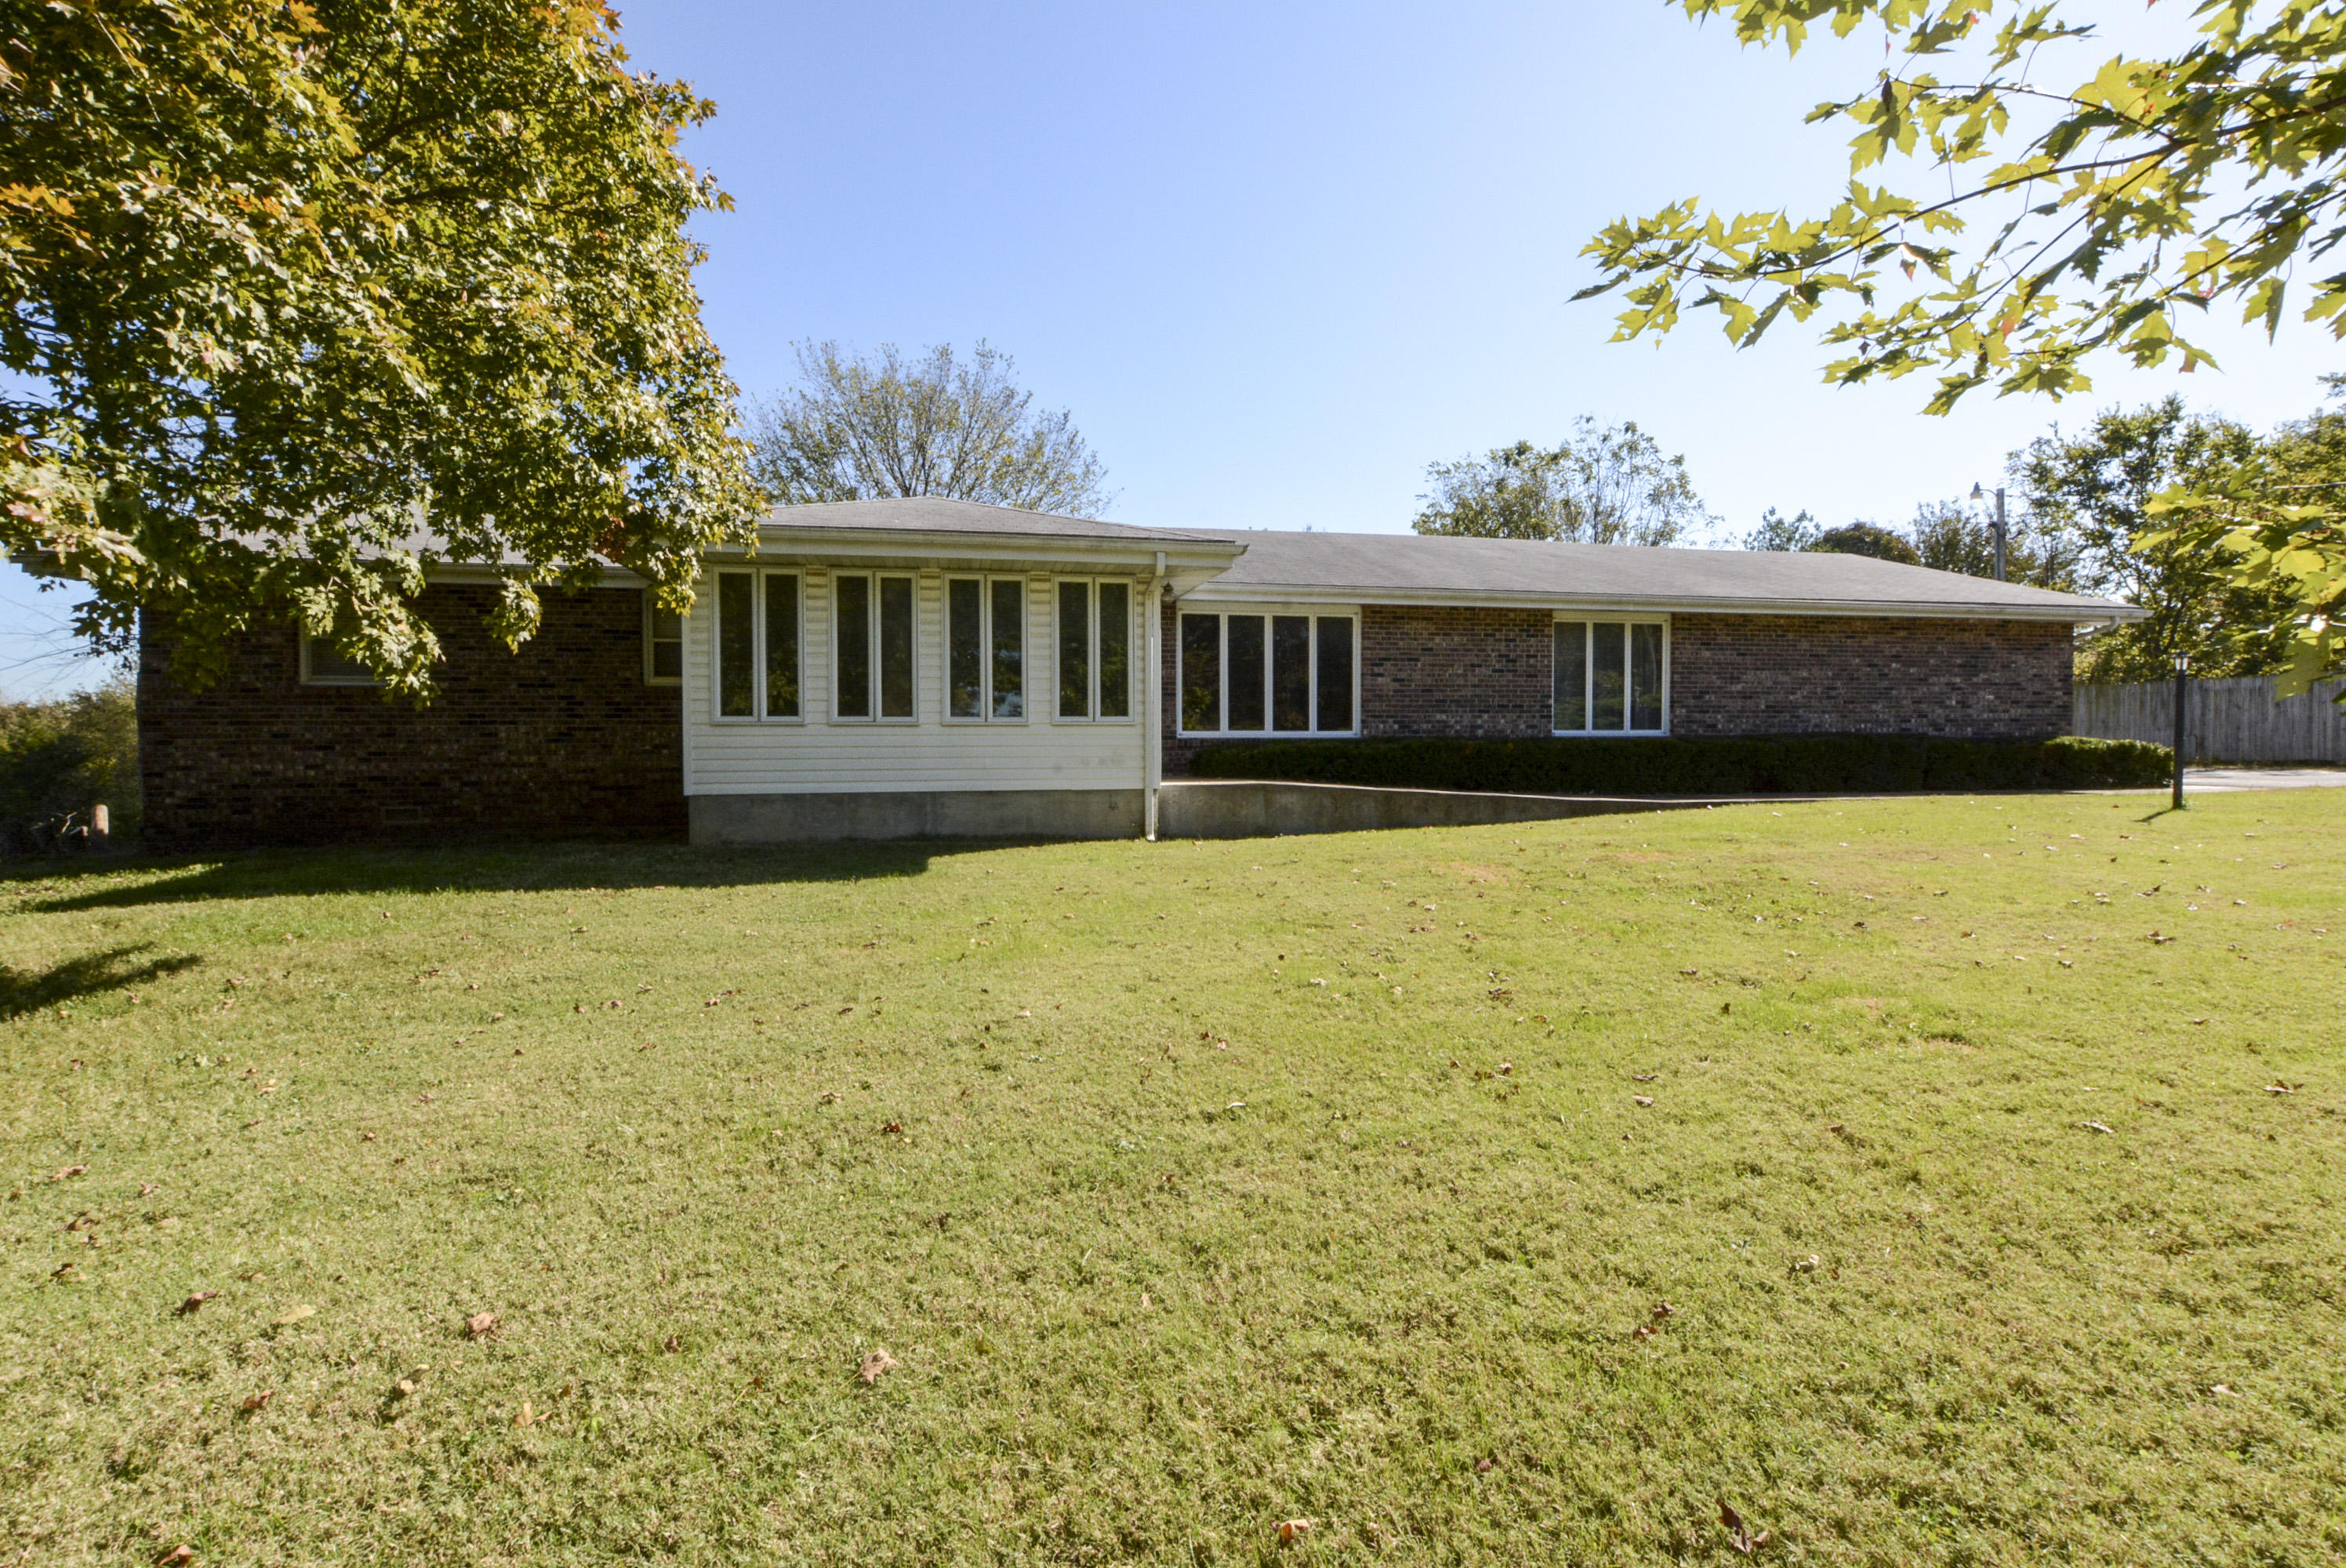 7129 North Farm Rd Willard, MO 65781